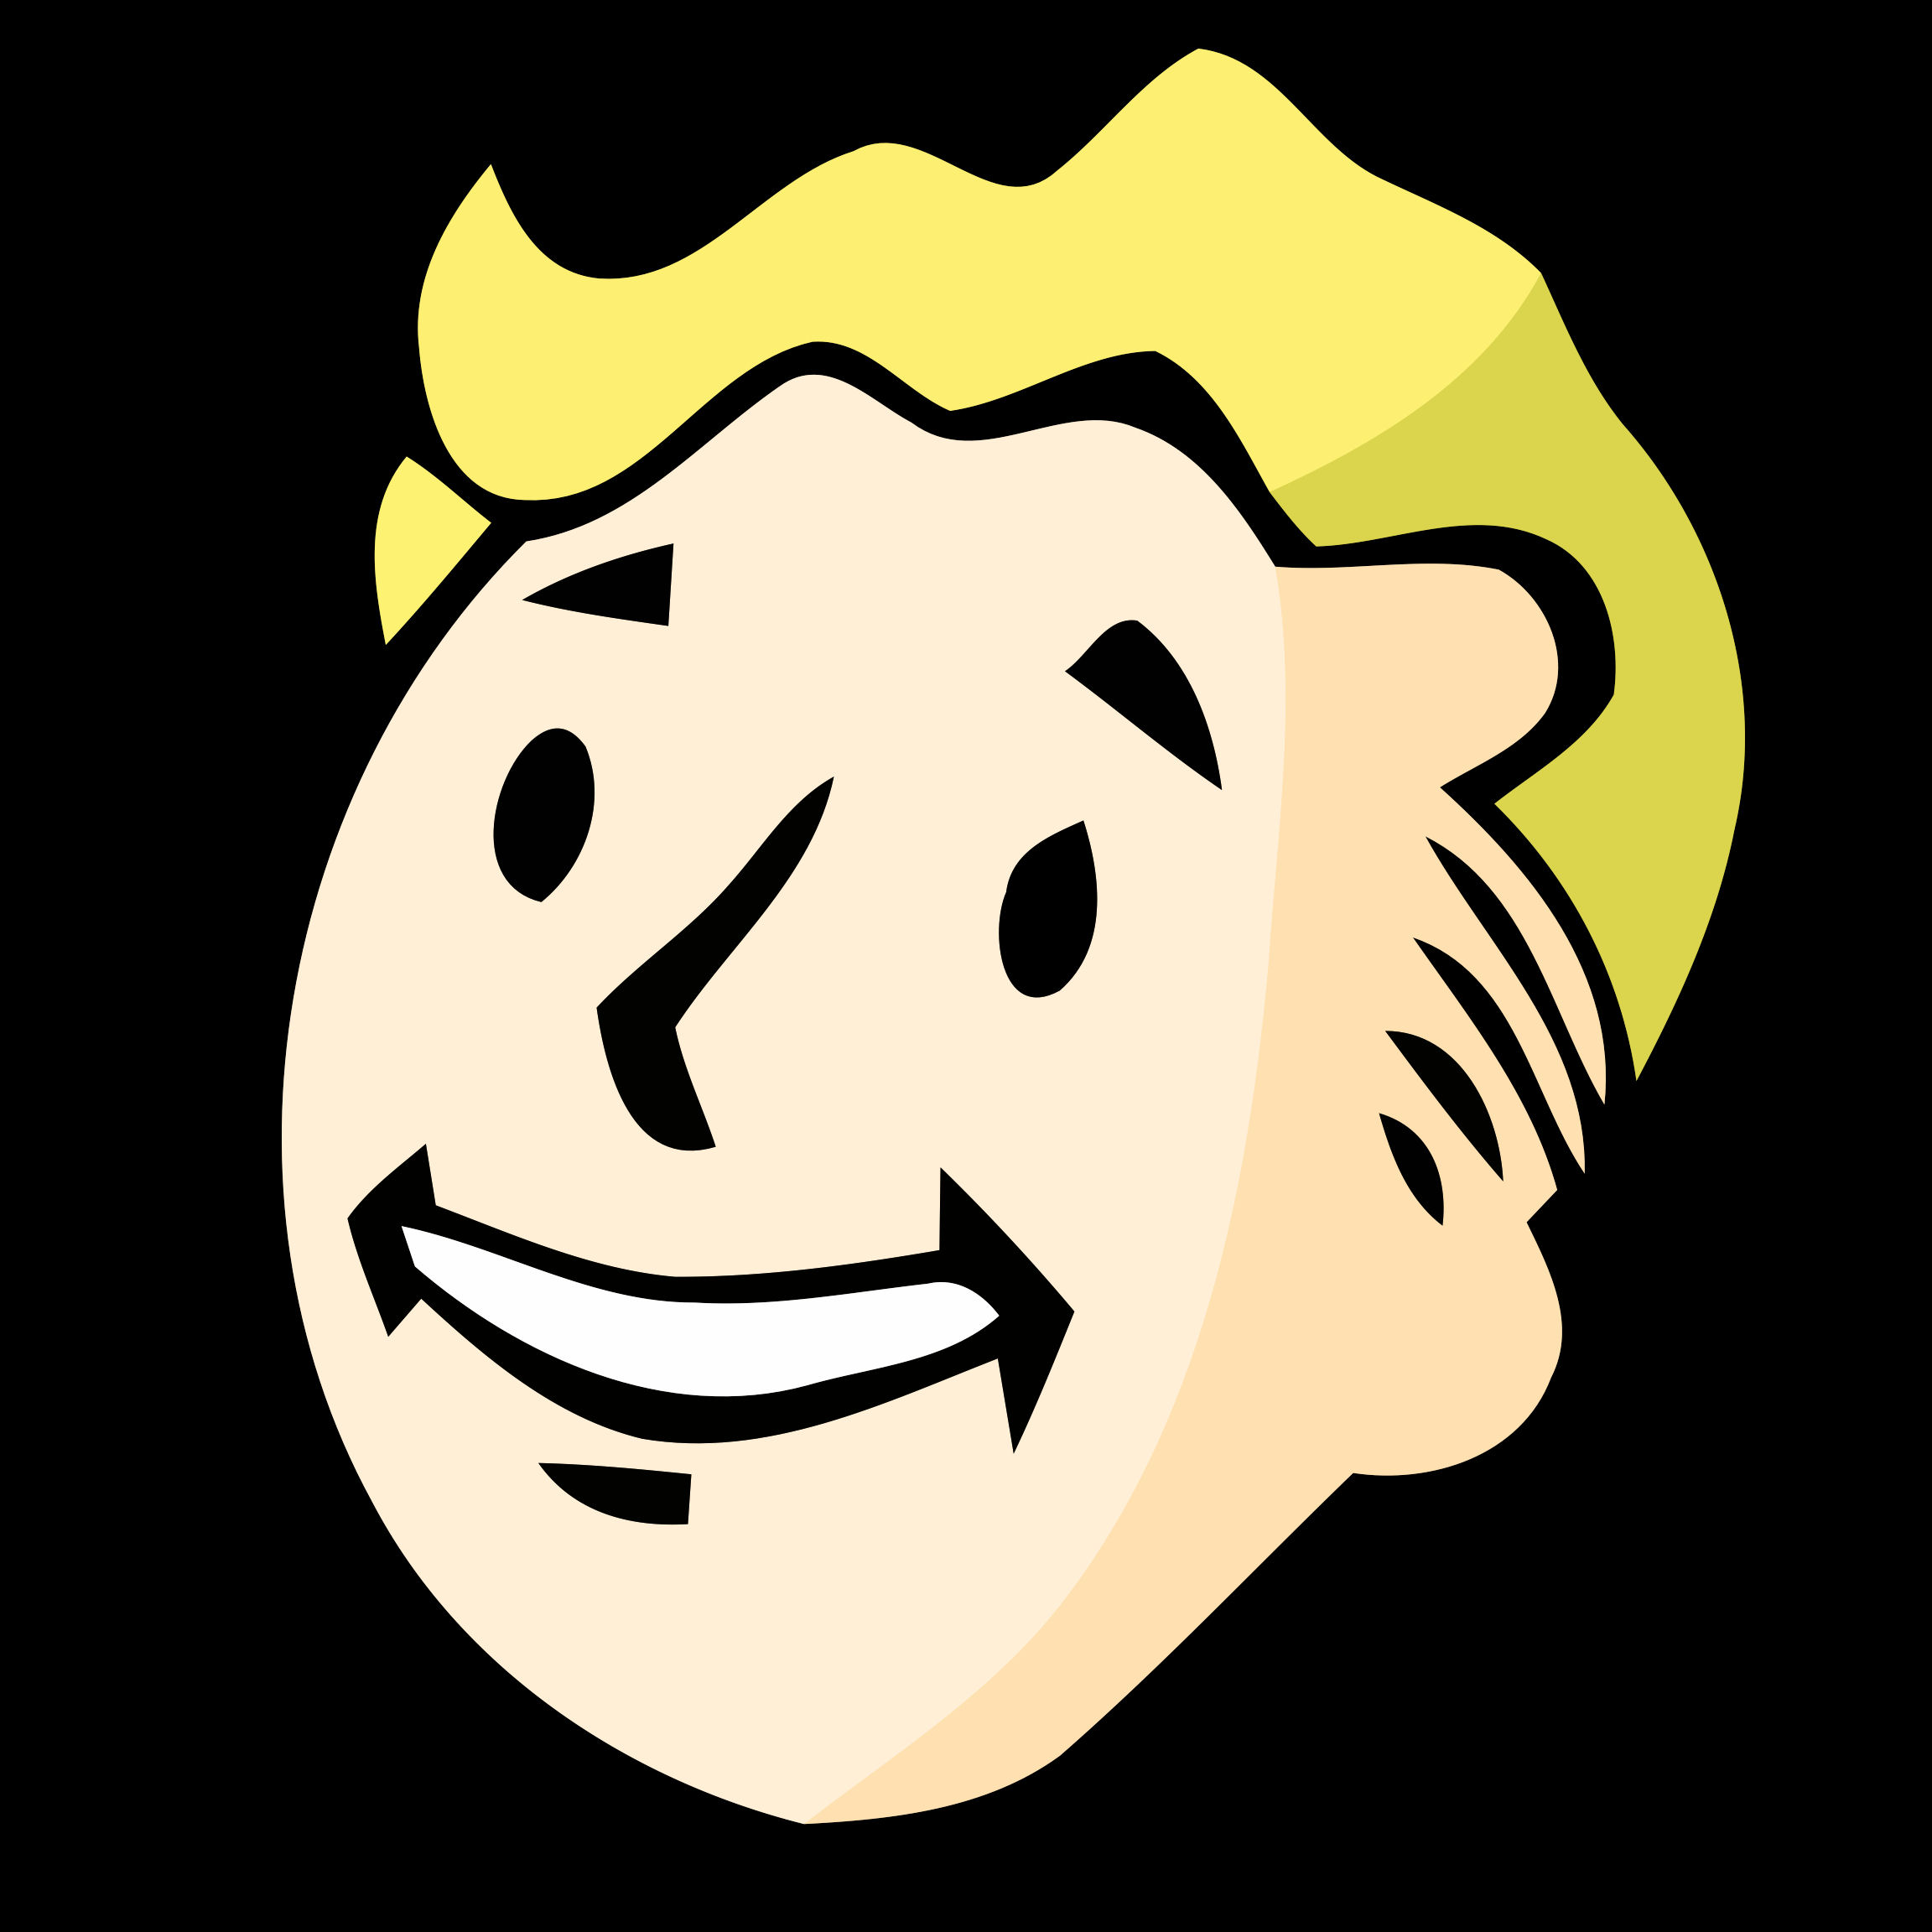 Free Download Fallout 3 Vault Boy Tattoo Pip Flash By Raveonmia